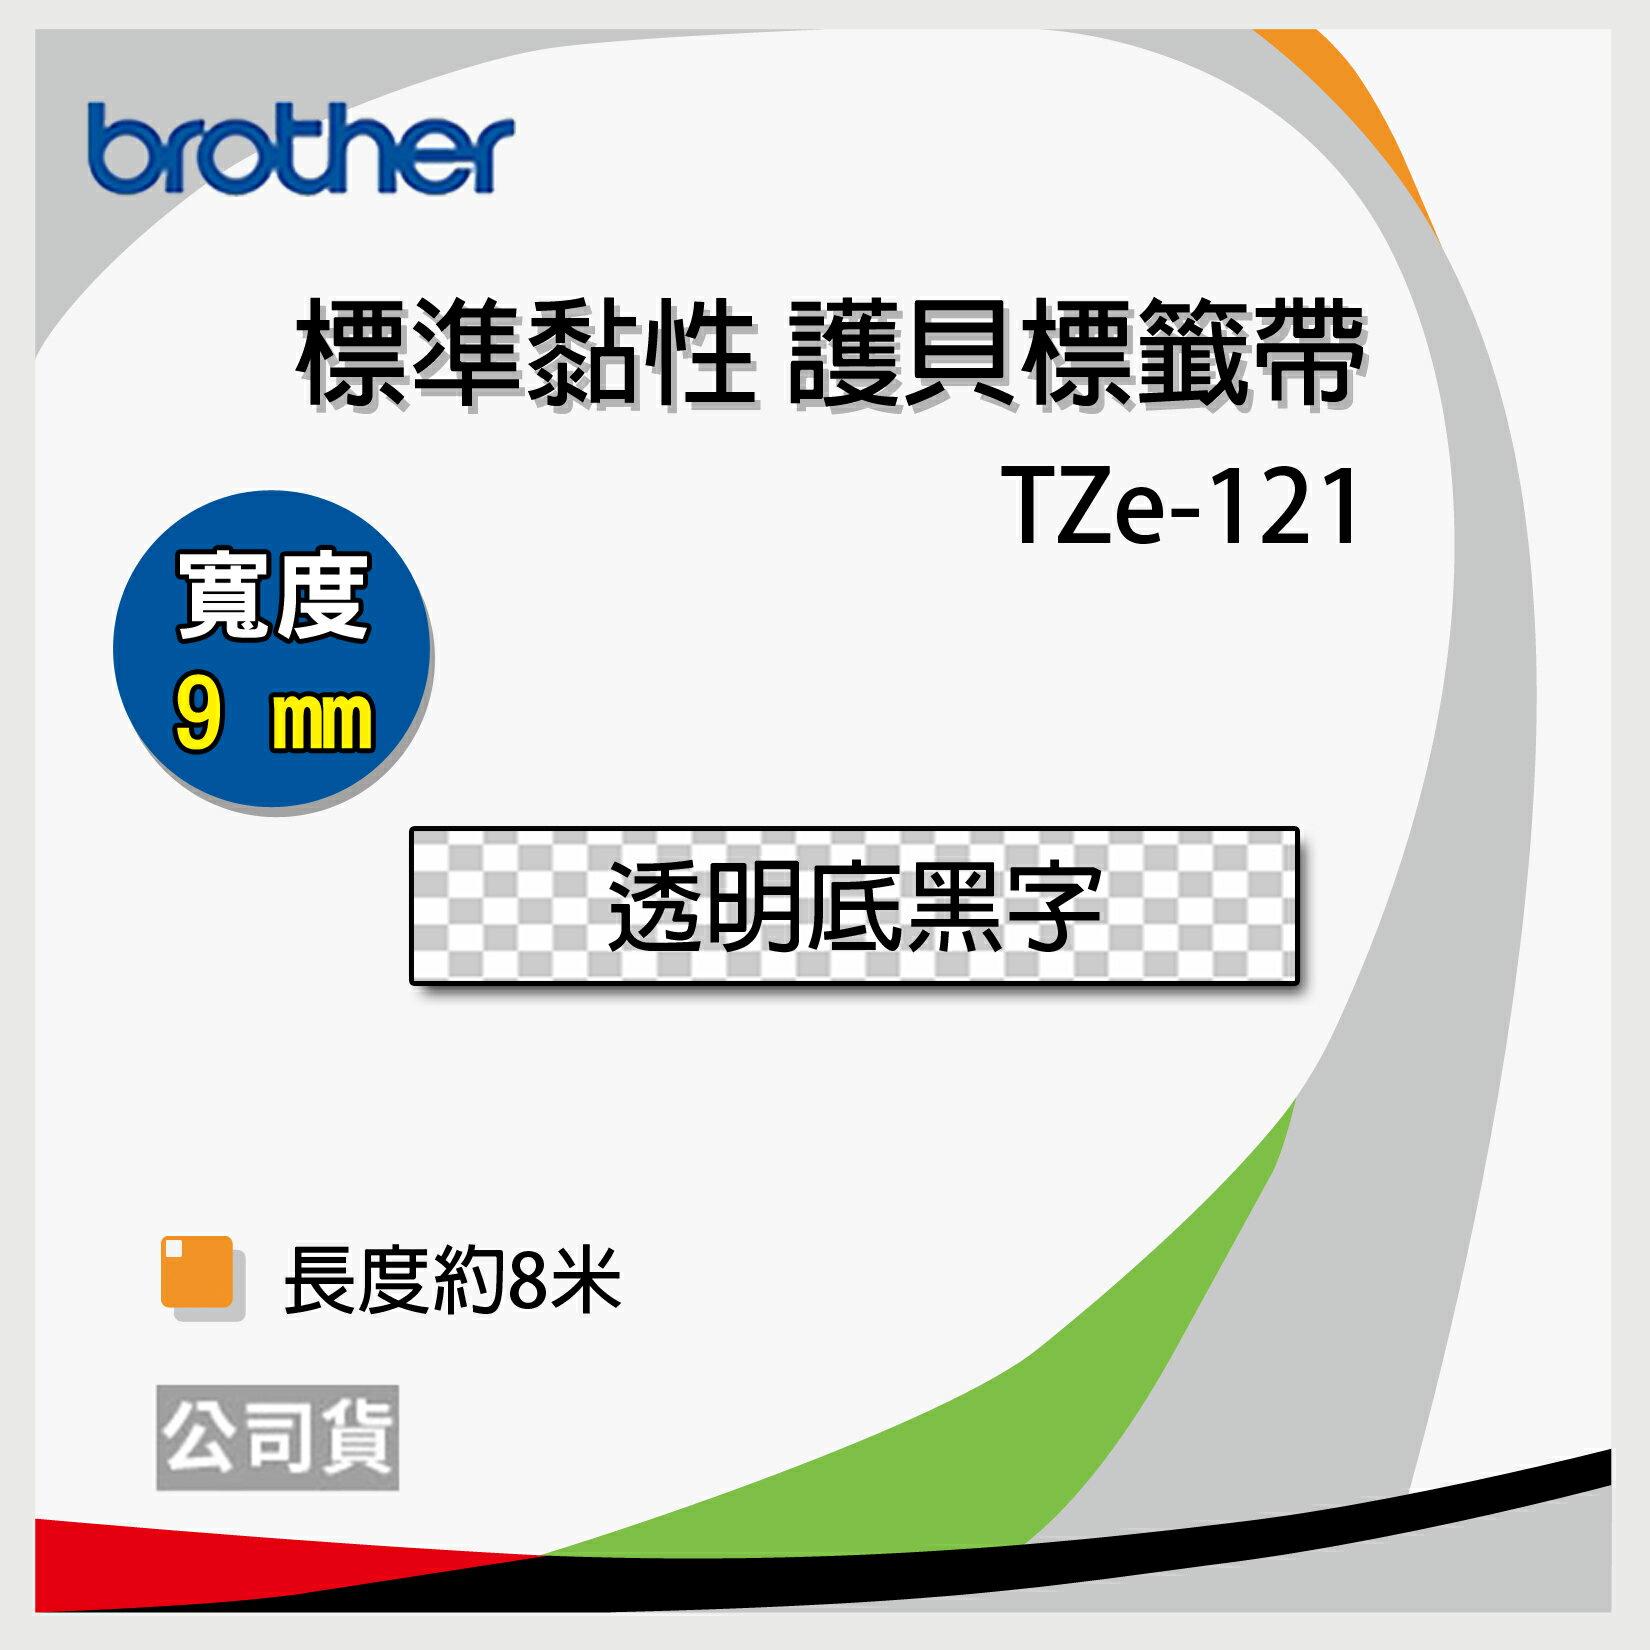 Brother 9mm 原廠護貝標籤帶系列 - TZ TZe-121 TZe-221 TZe-421 TZe-521 TZe-621 TZe-721 TZe-222 TZe-223